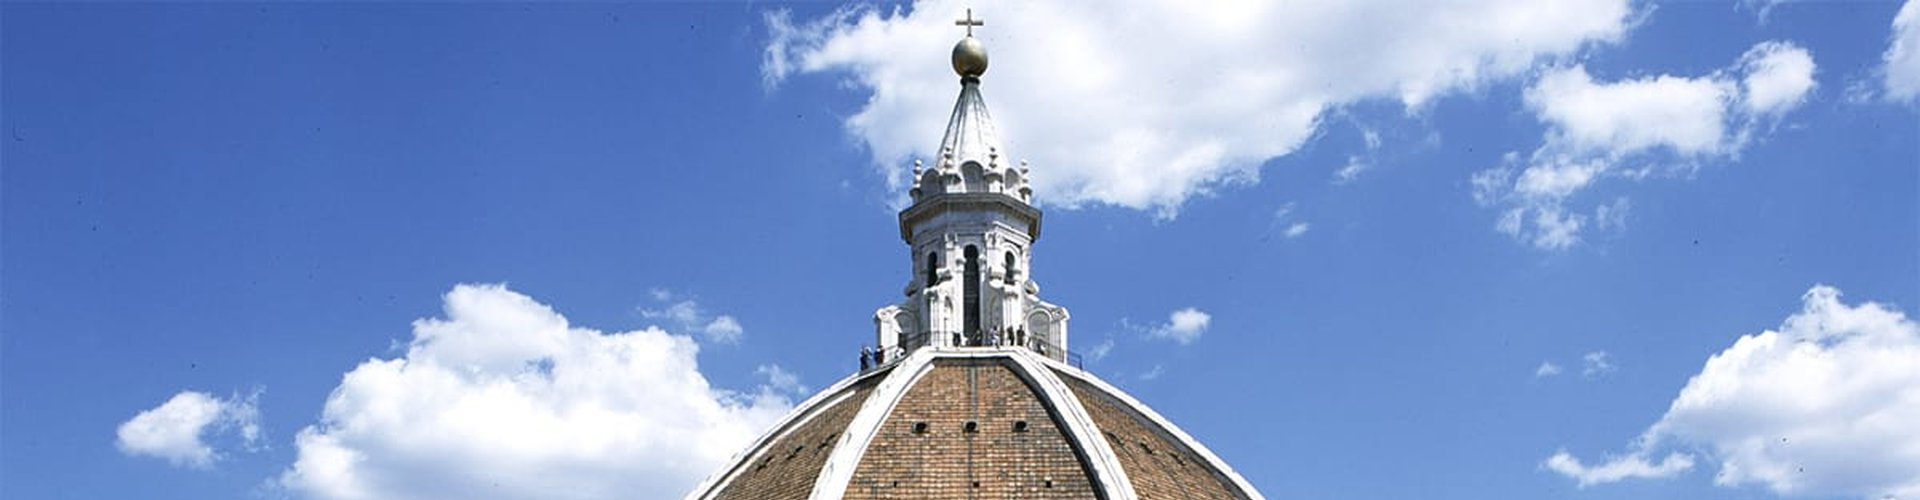 The Brunelleschi Dome | The  Opera del Duomo of Florence